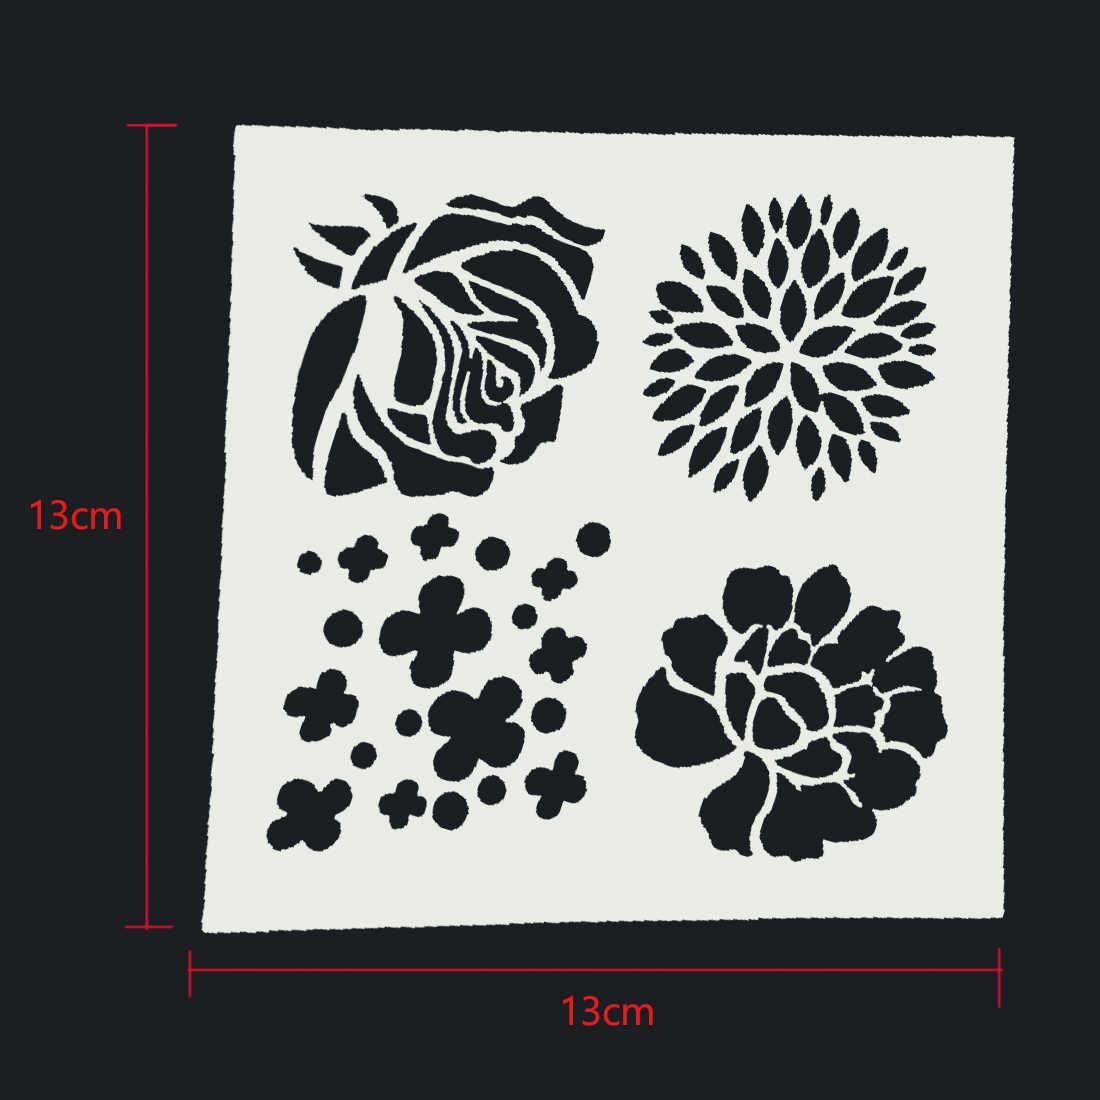 Plastic Cake Foam Spray Template Barista Stencils Decoration Tool Garland Mold Fancy Cake Printing Flower Model